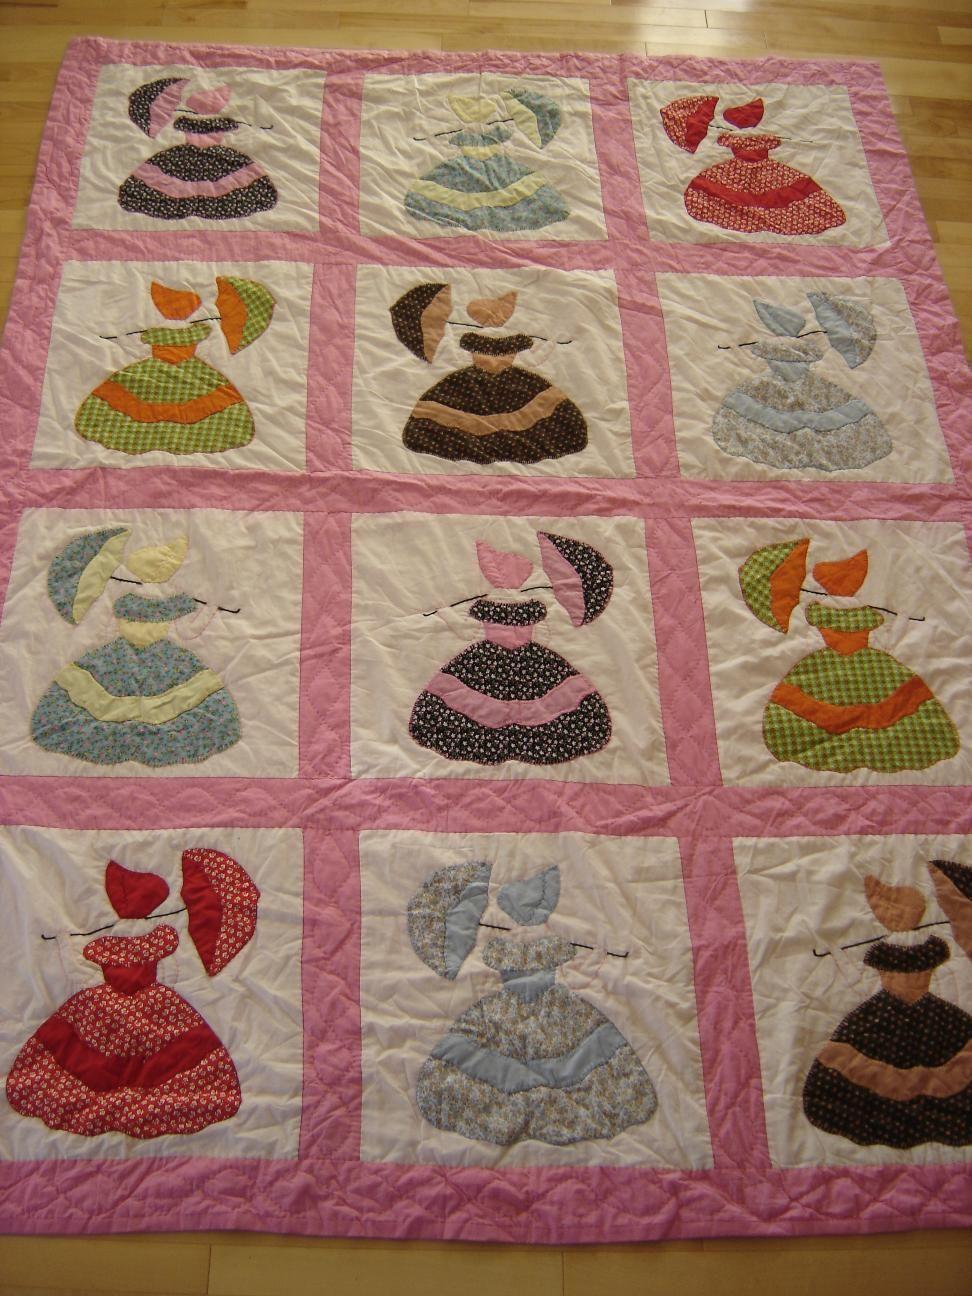 Dutch Girl Quilt | Q Sunbonnet, Girls, Fashion Quilts | Pinterest - Free Printable Dutch Girl Quilt Pattern